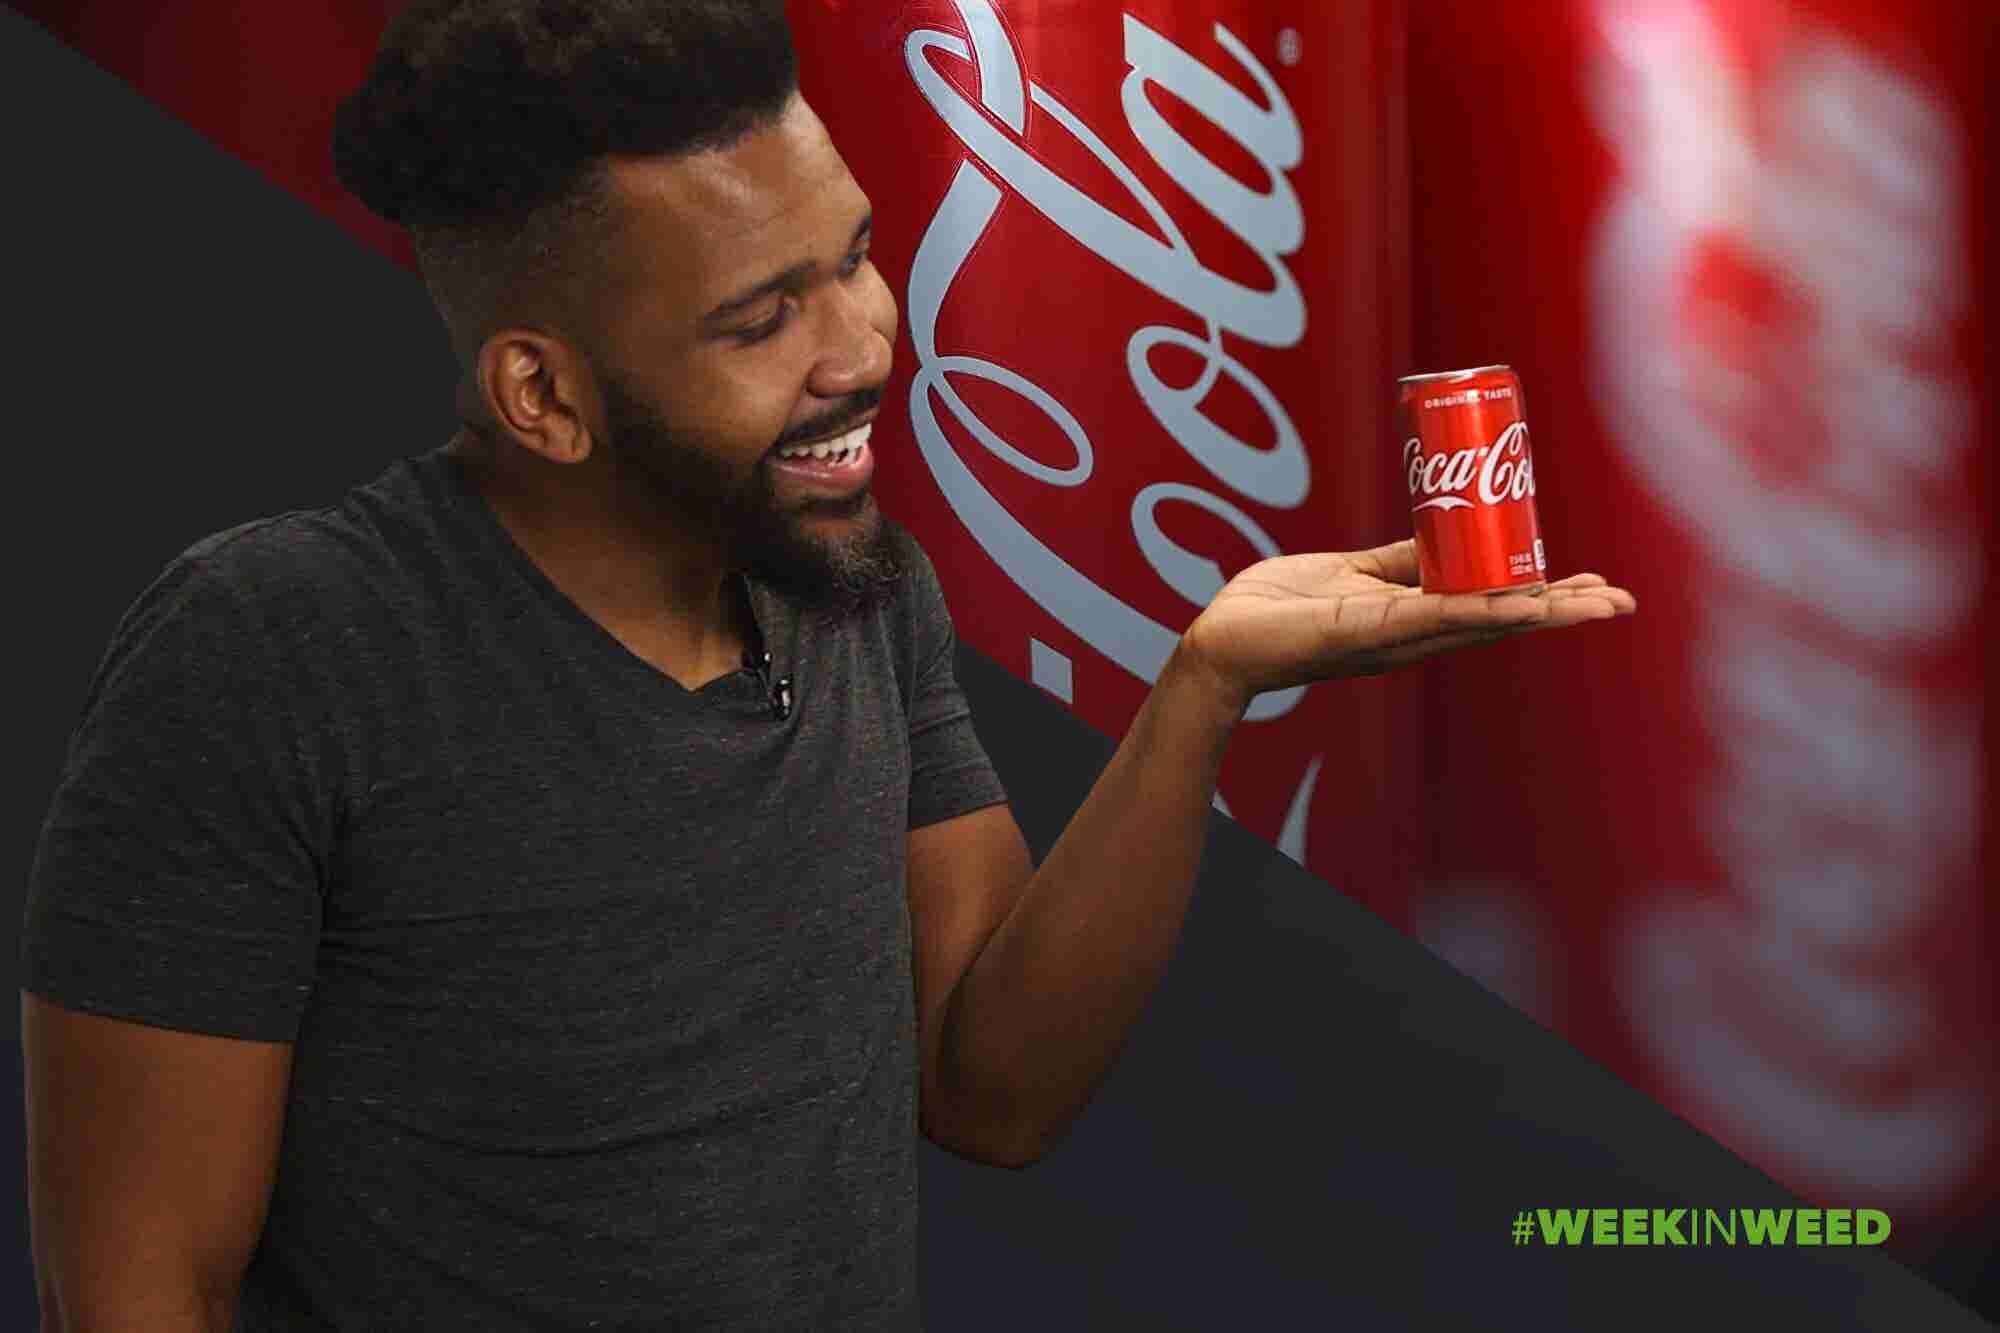 This Week in Weed: Coca Cola Considers Cannabis!